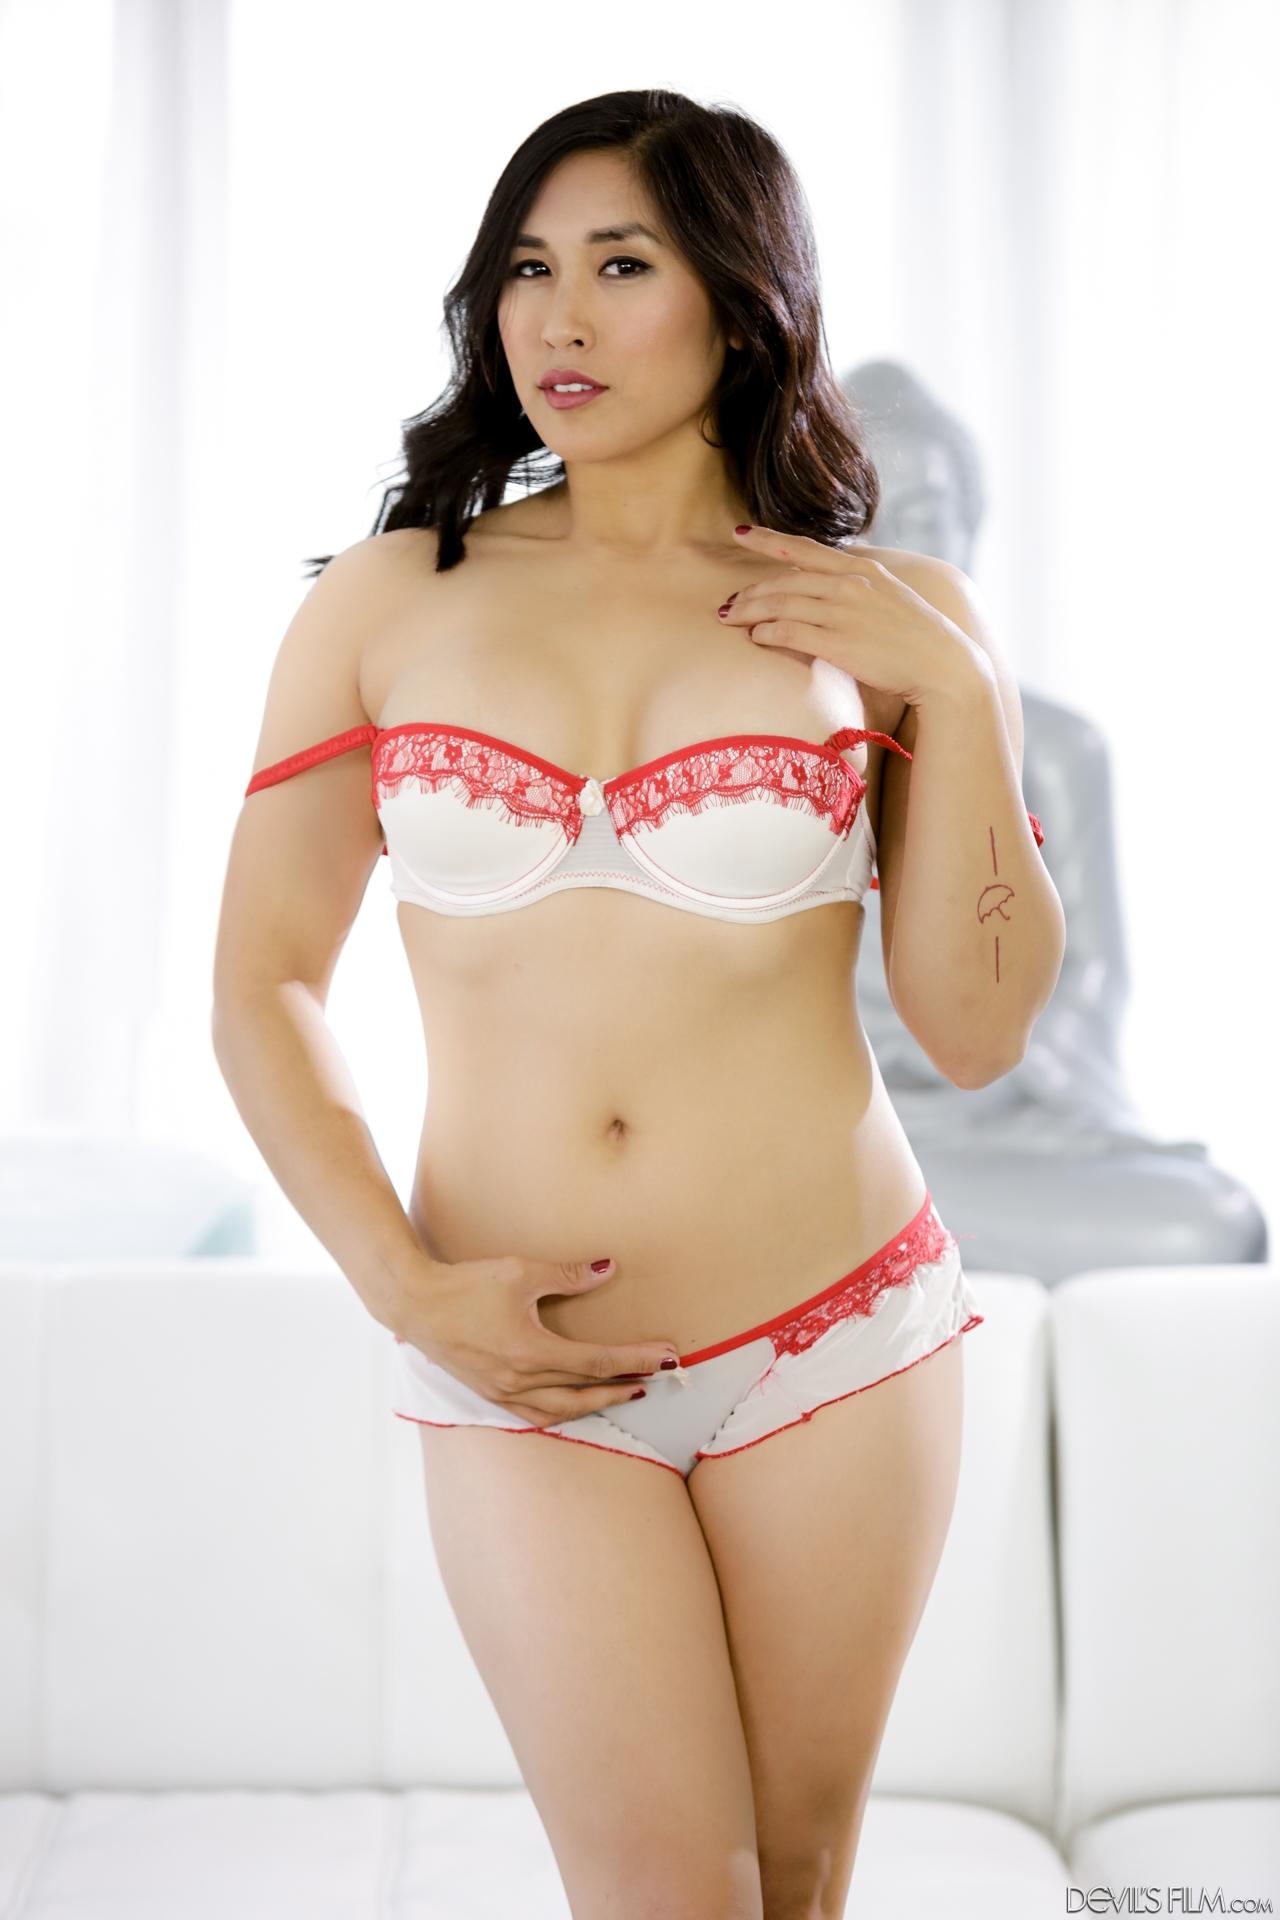 Asian Mia - Mia Li Porn Galleries by Date